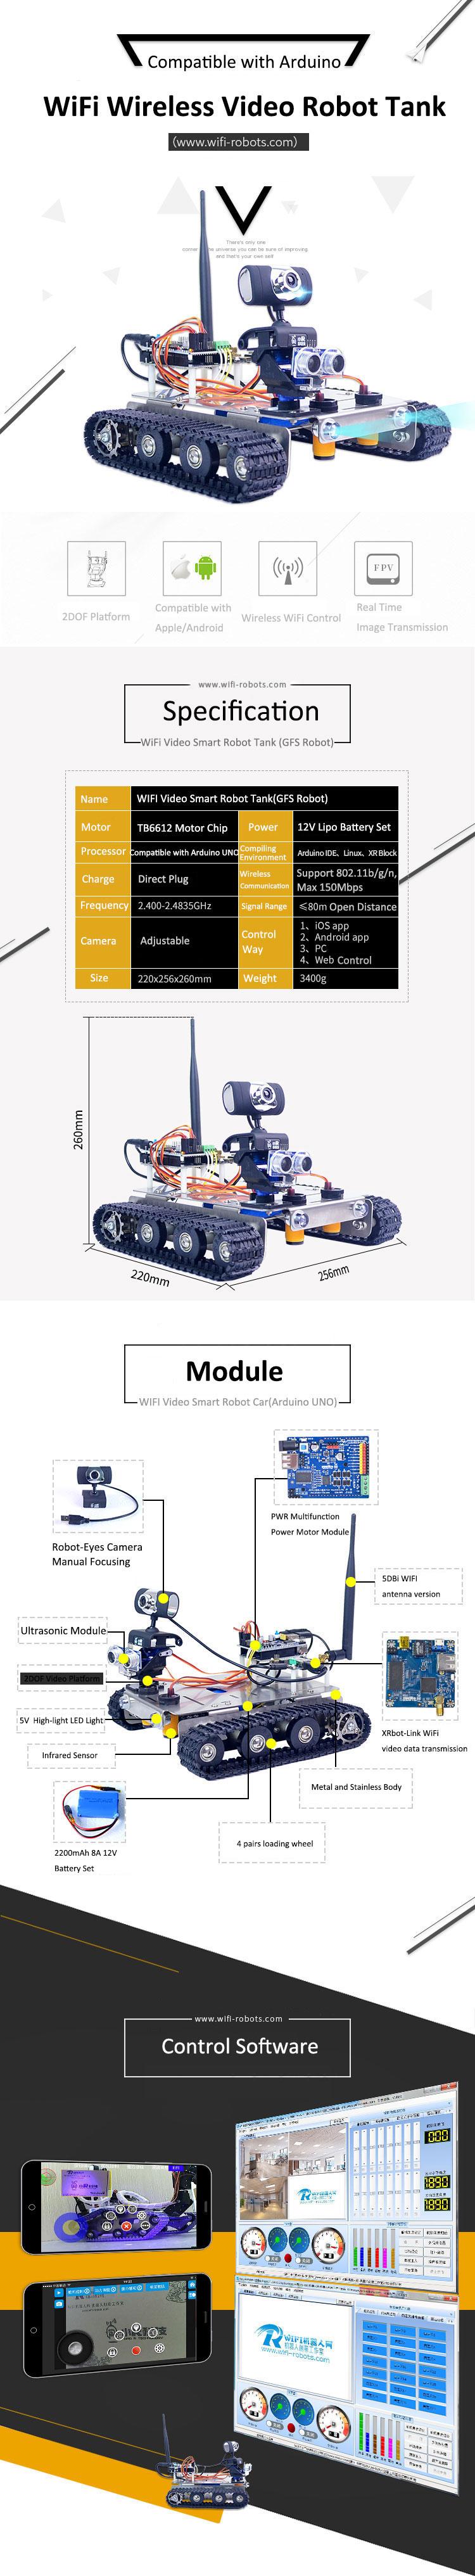 Xiao R DIY GFS WiFi Wireless Video Control Smart Robot Tank